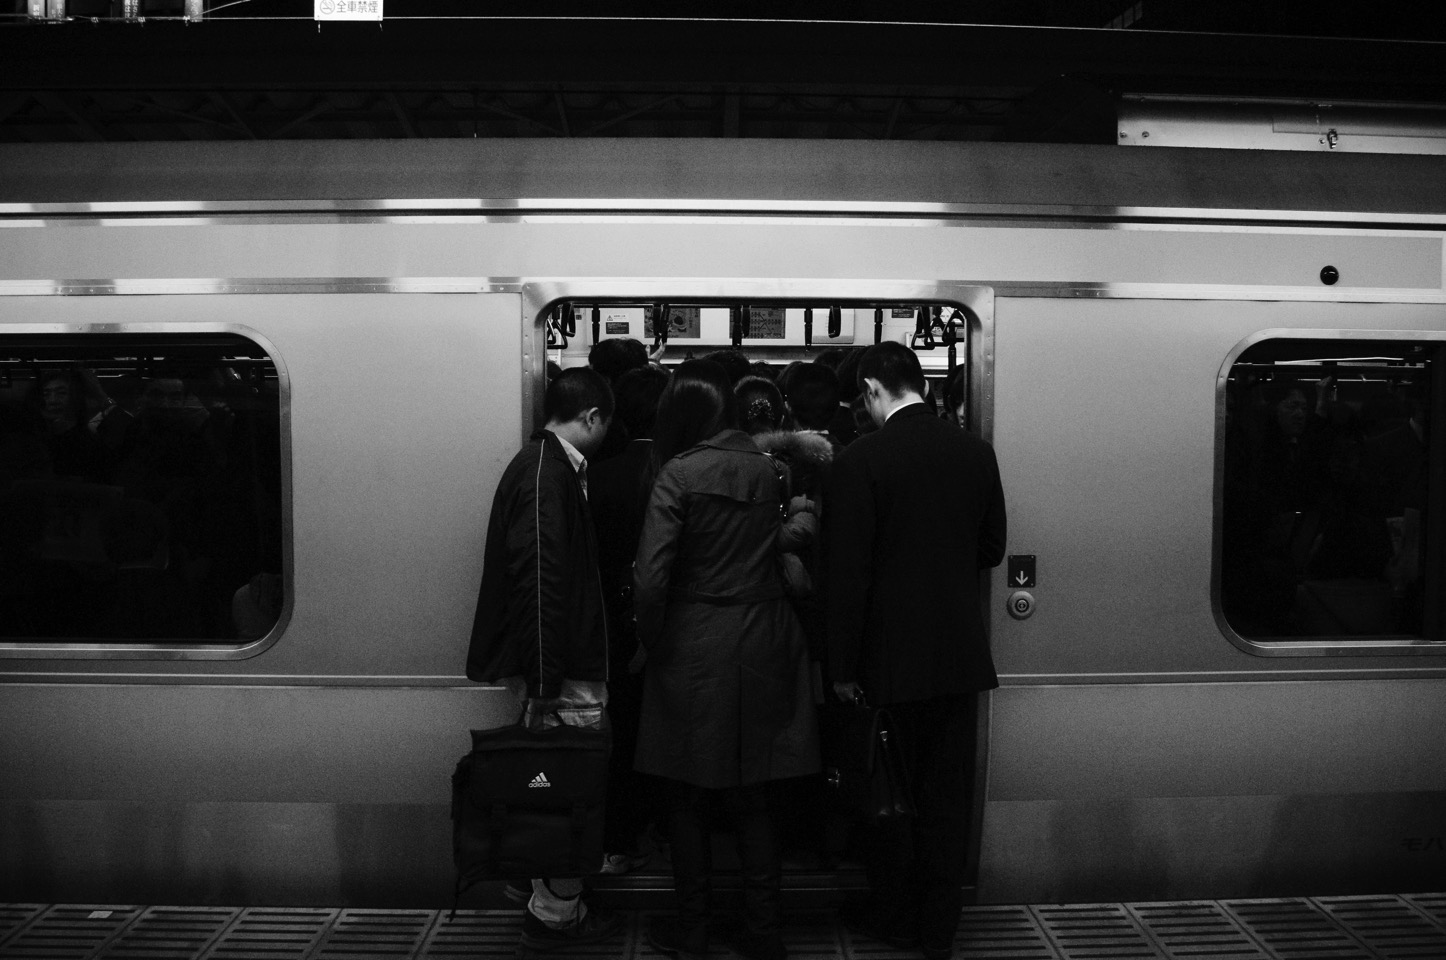 Crammed train